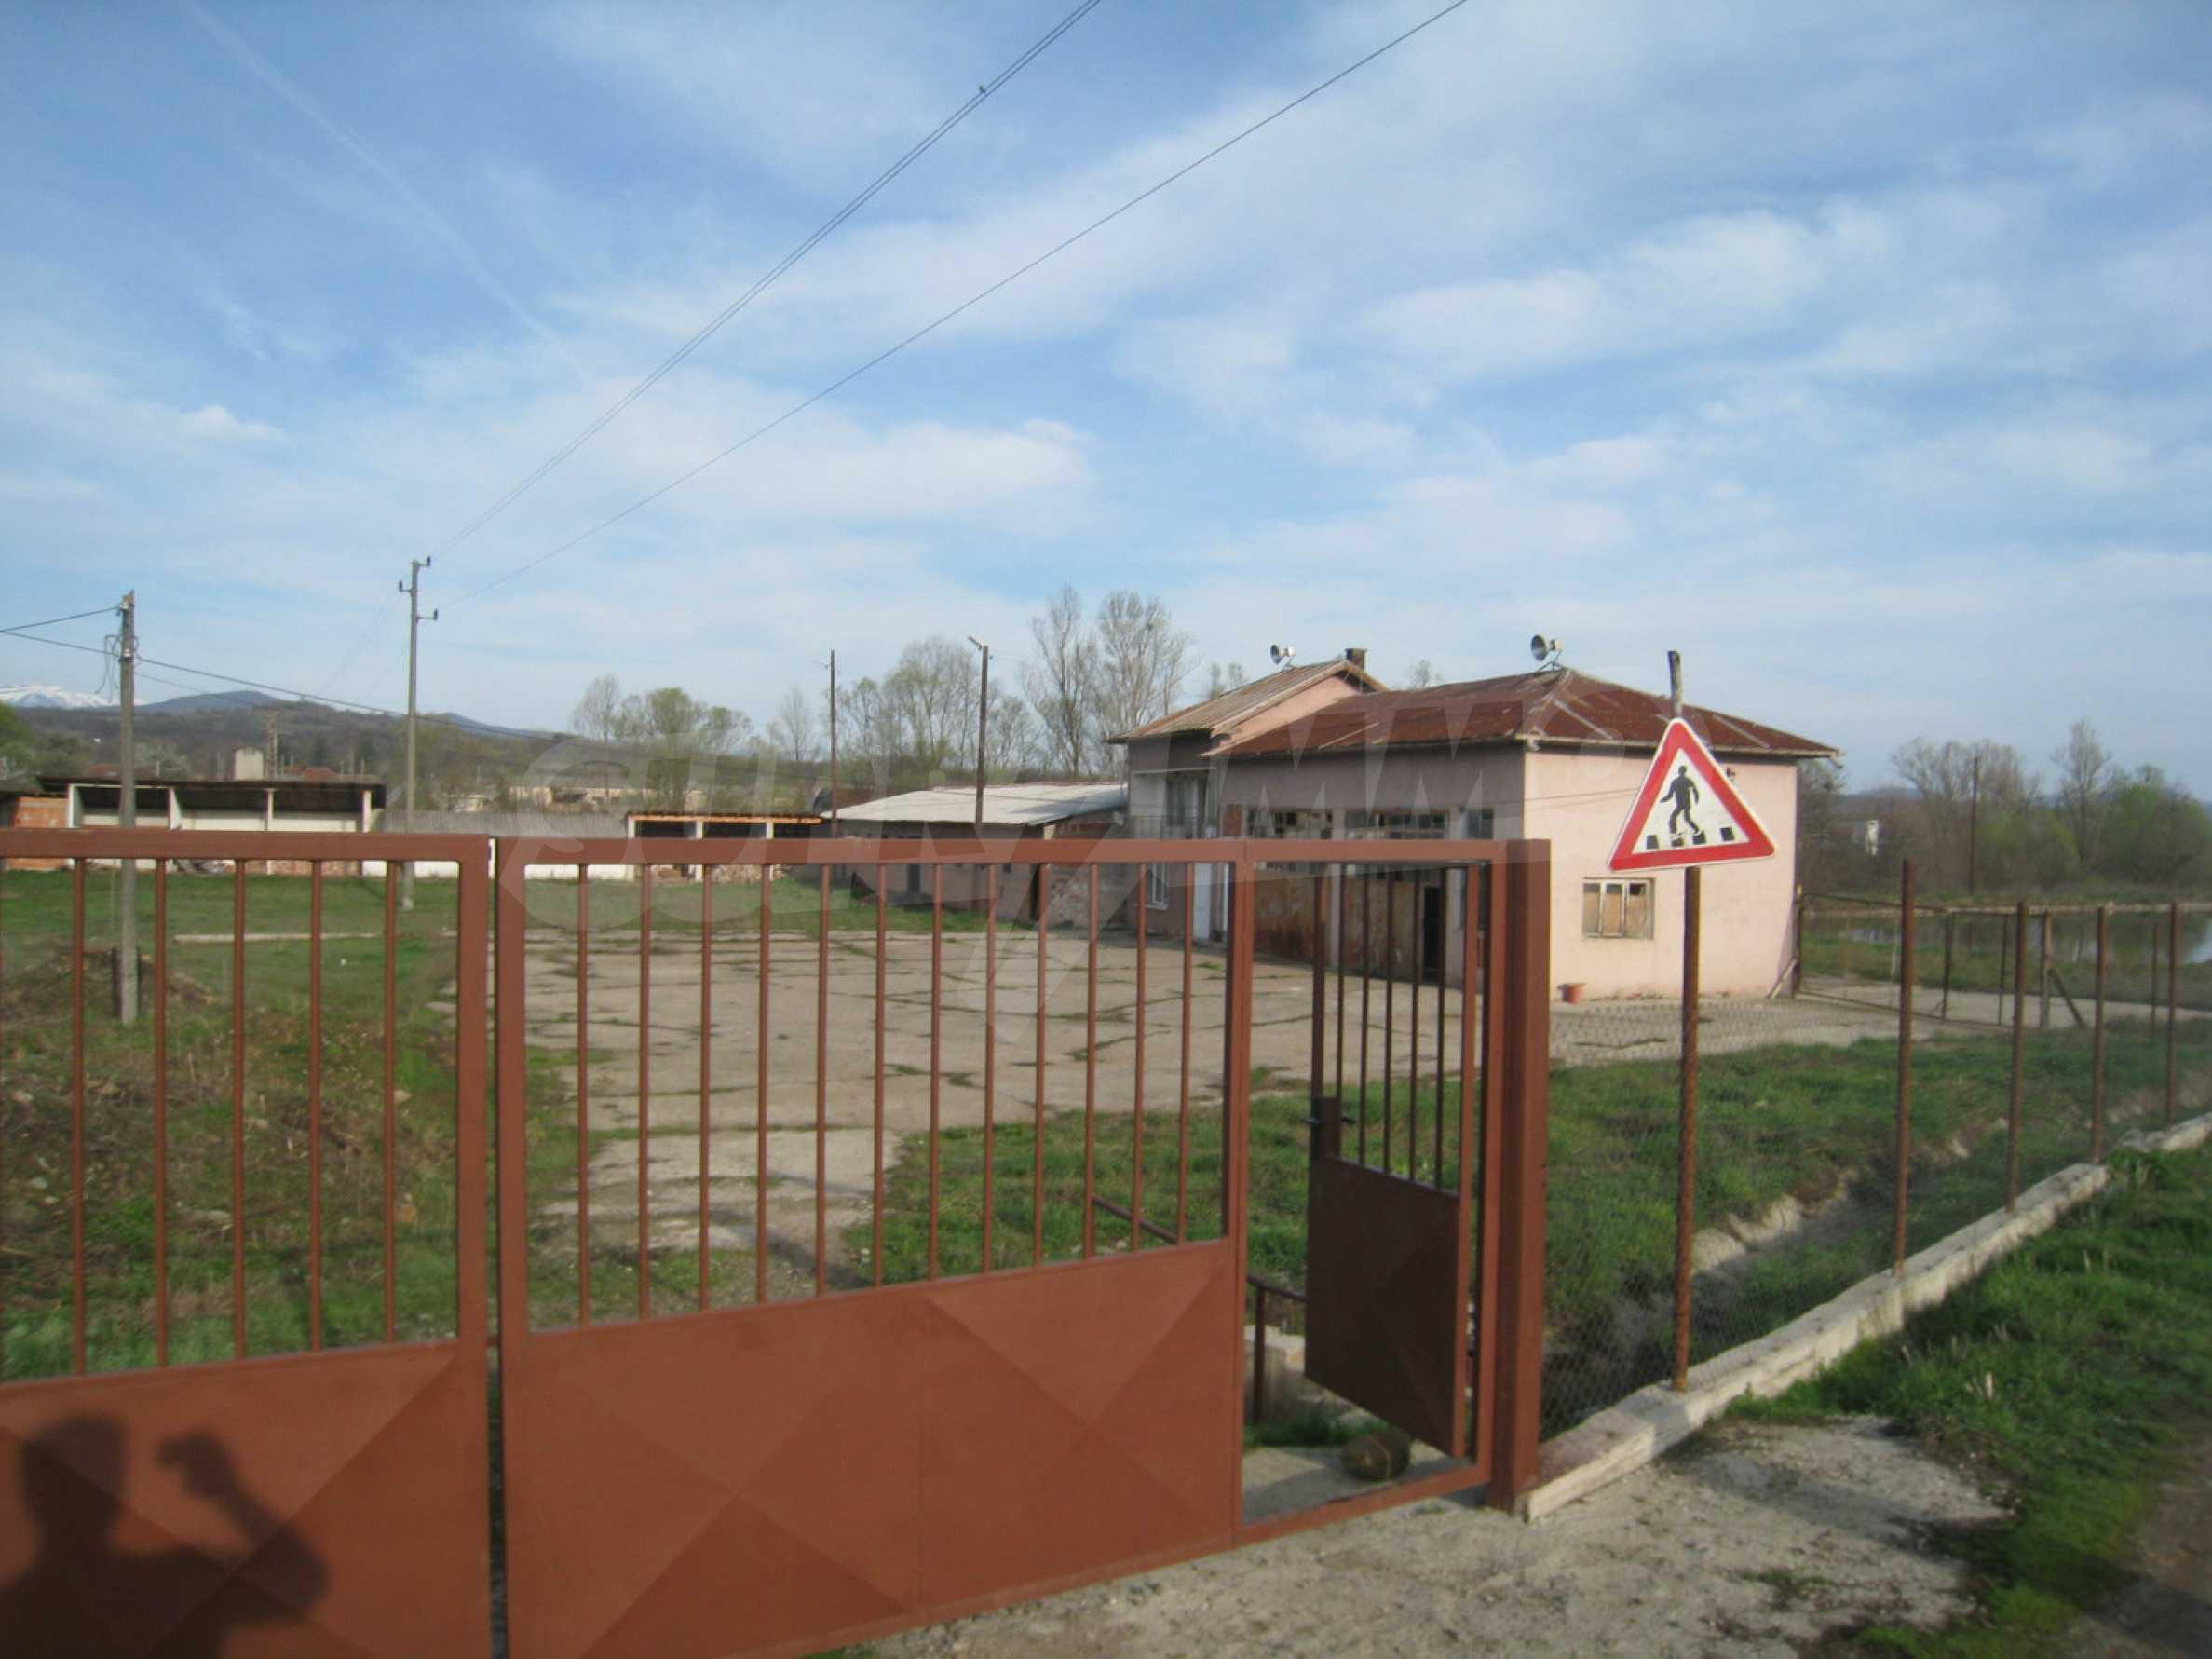 Fishpond, warehouses, residential areas and asphalt ground near Montana 43